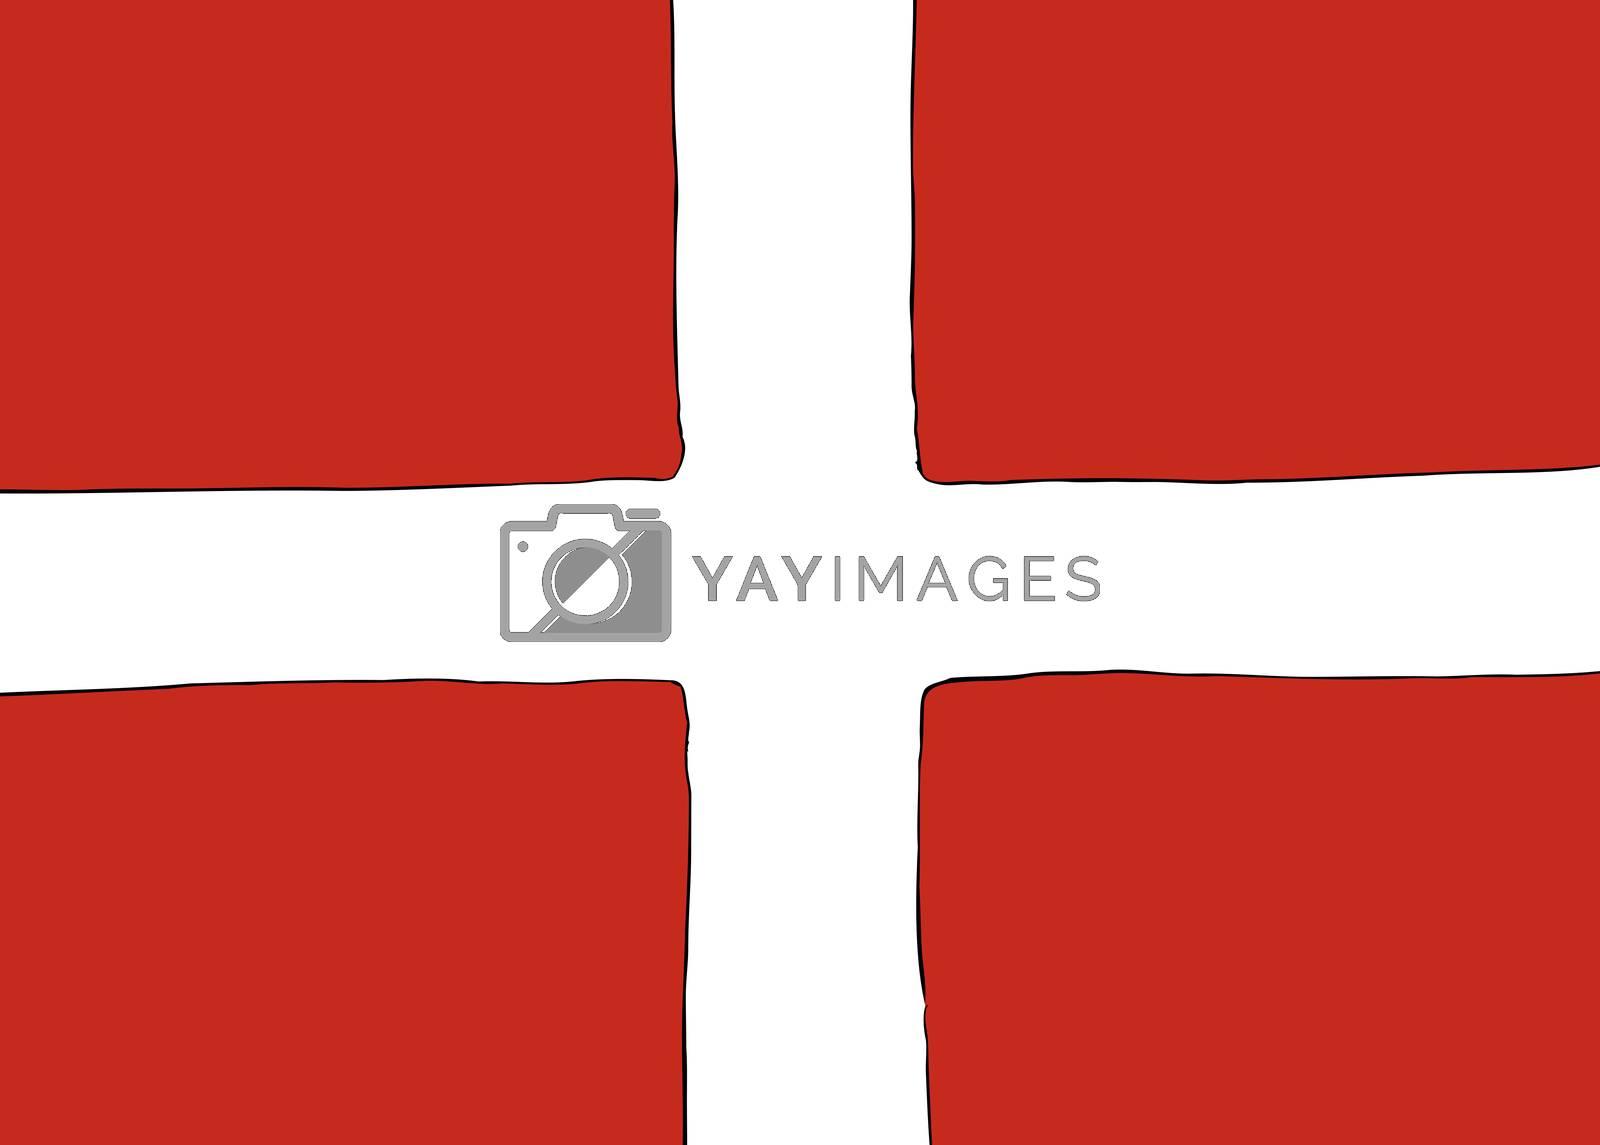 Symmetrical centered version of a Nordic Cross flag representing Denmark